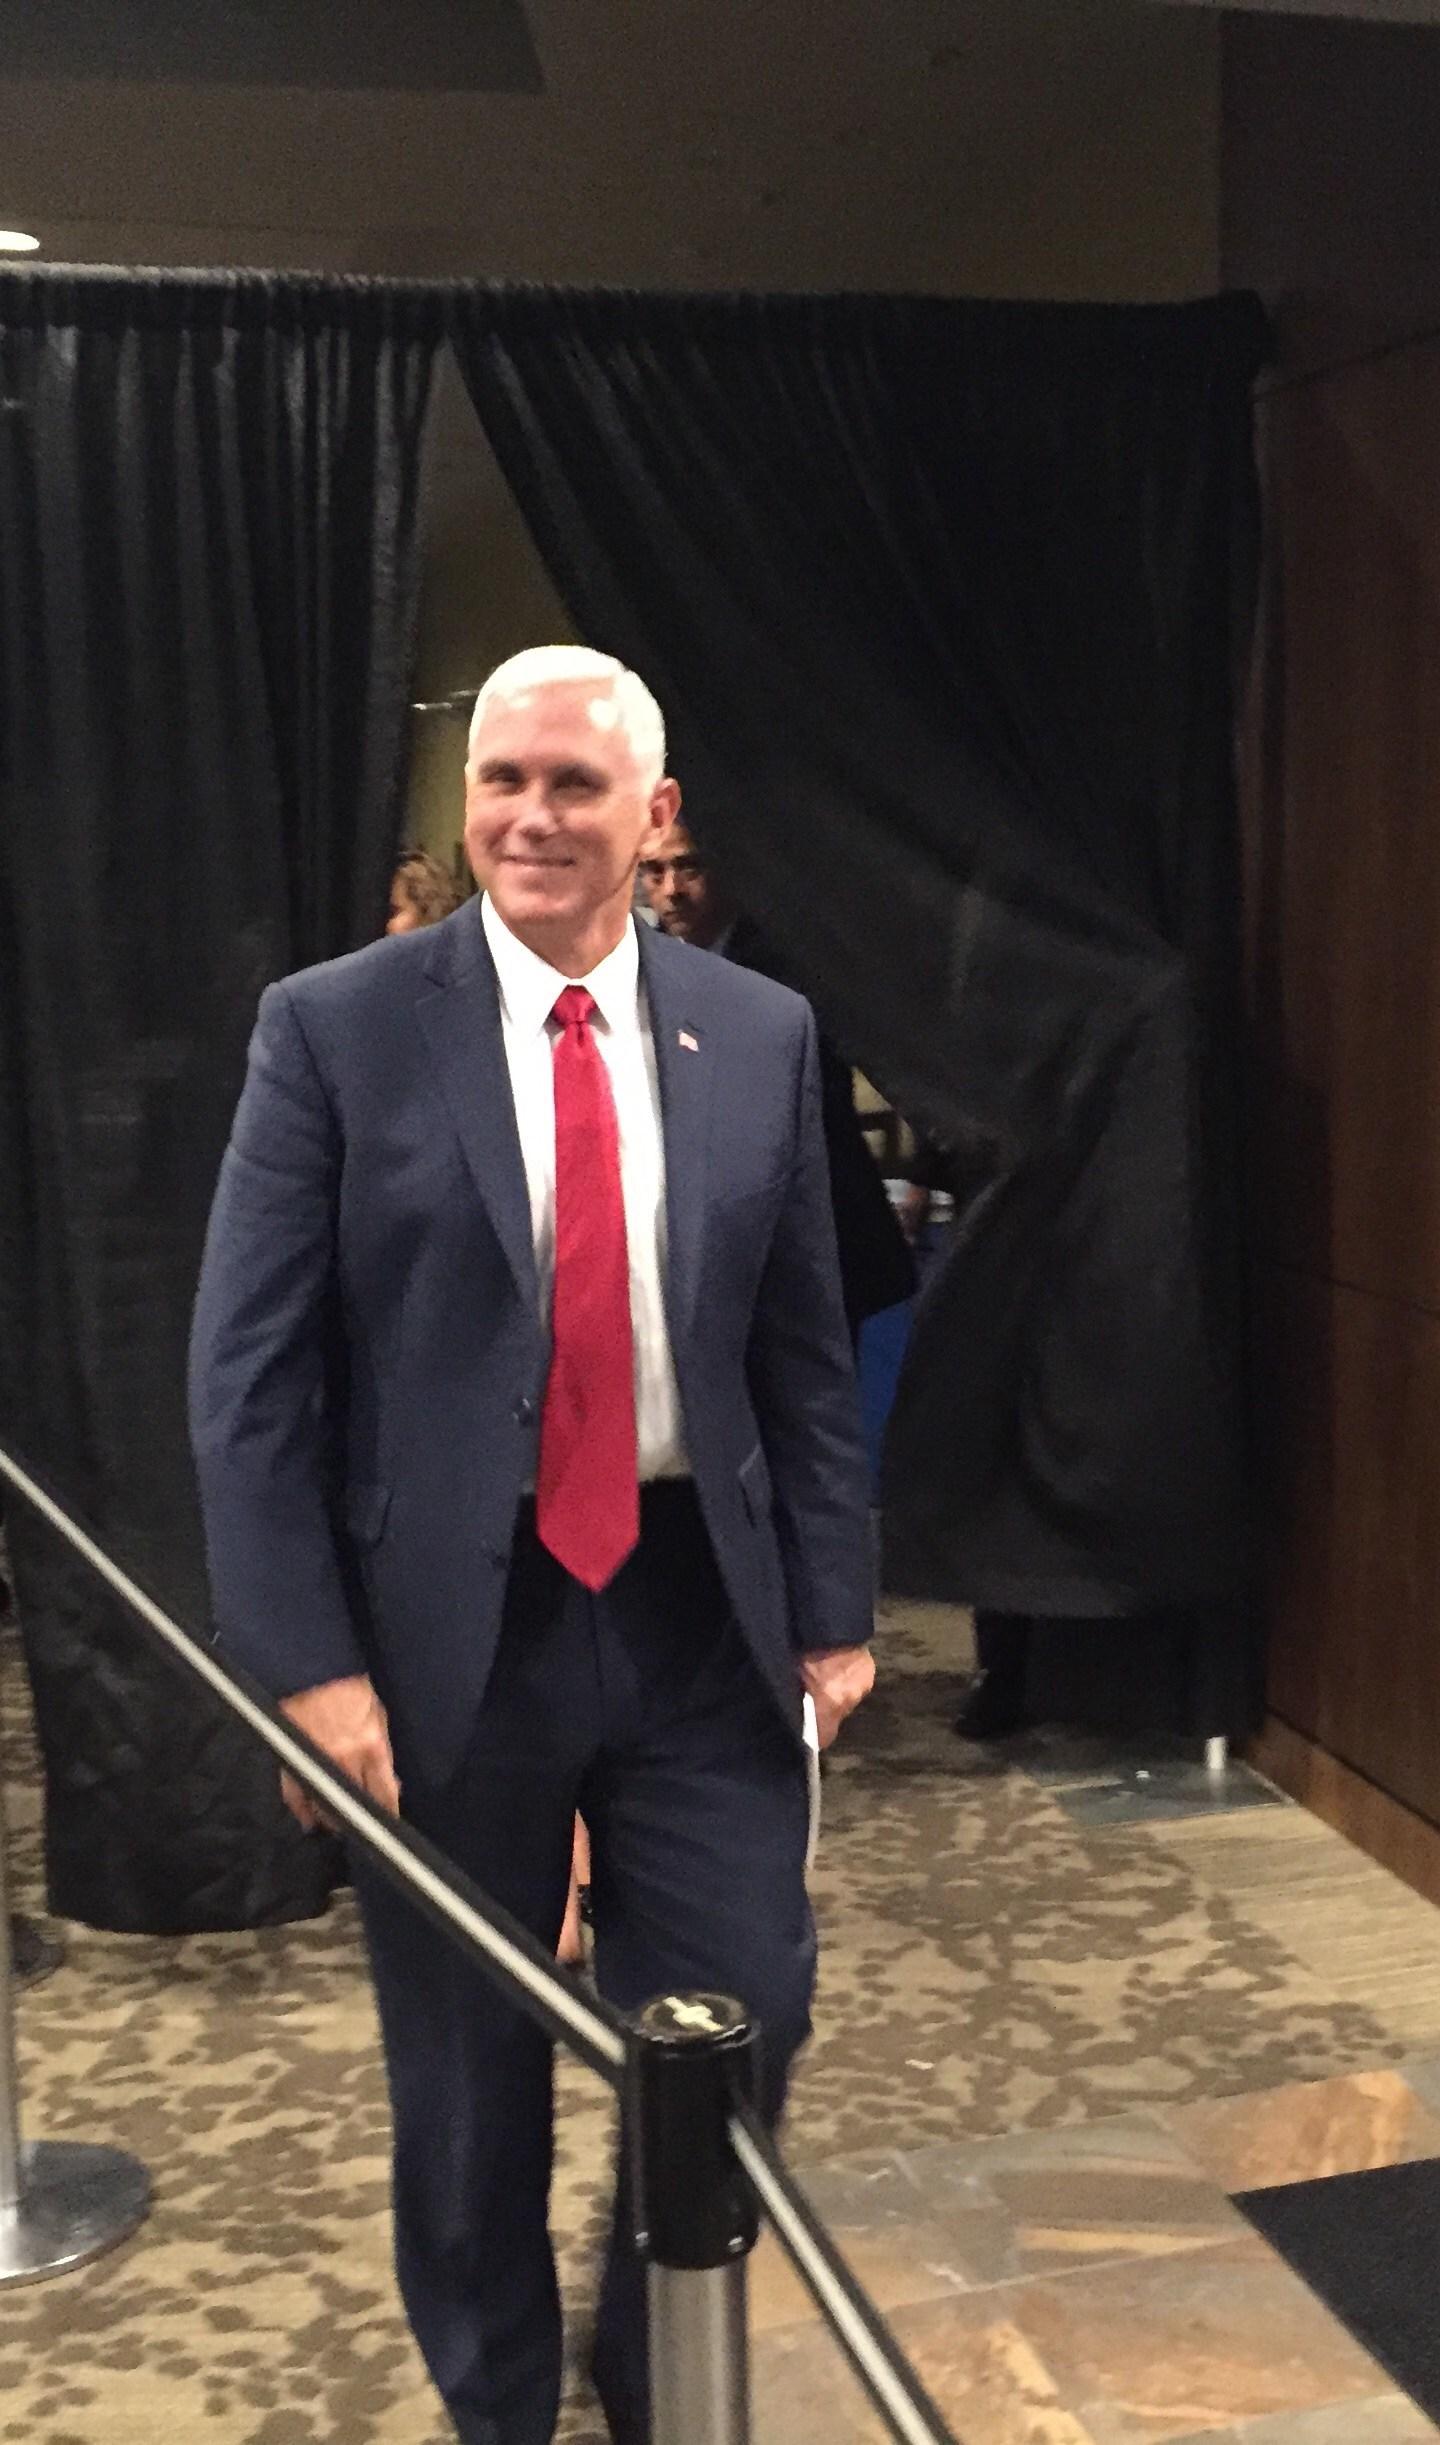 Mike Pence in Utah